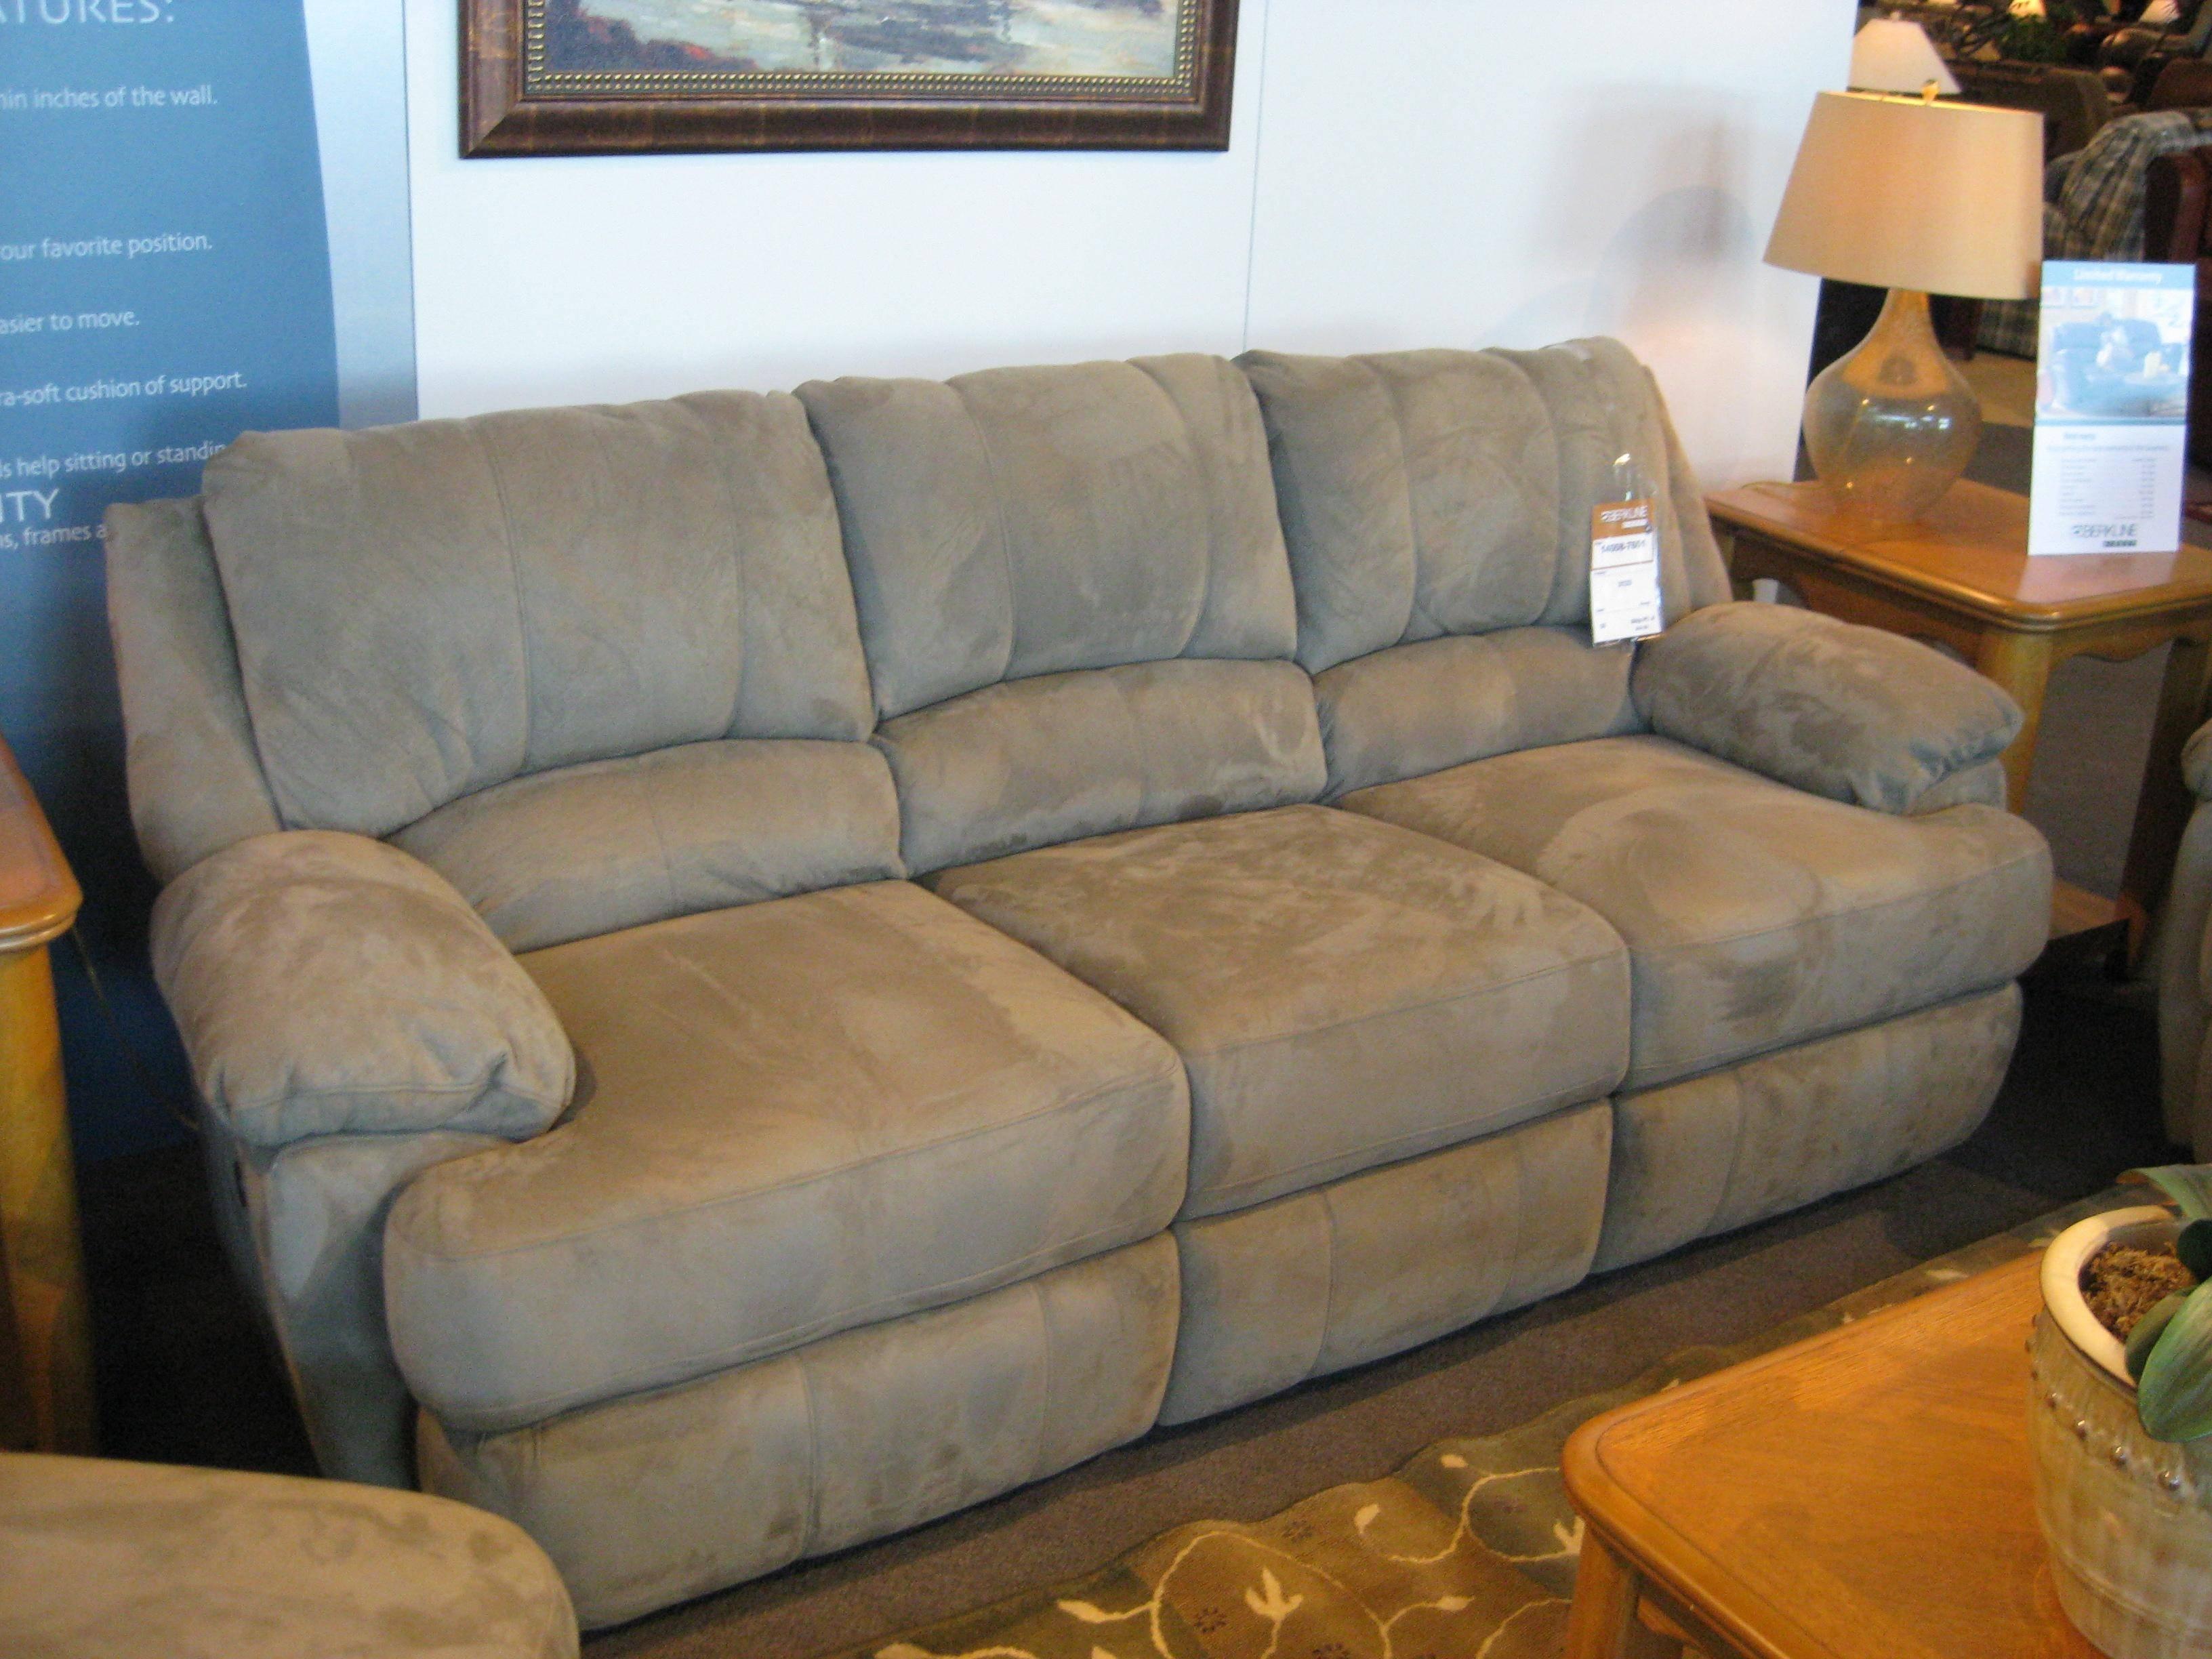 2017 Latest Berkline Recliner Sofas | Sofa Ideas inside Berkline Leather Recliner Sofas (Image 3 of 15)